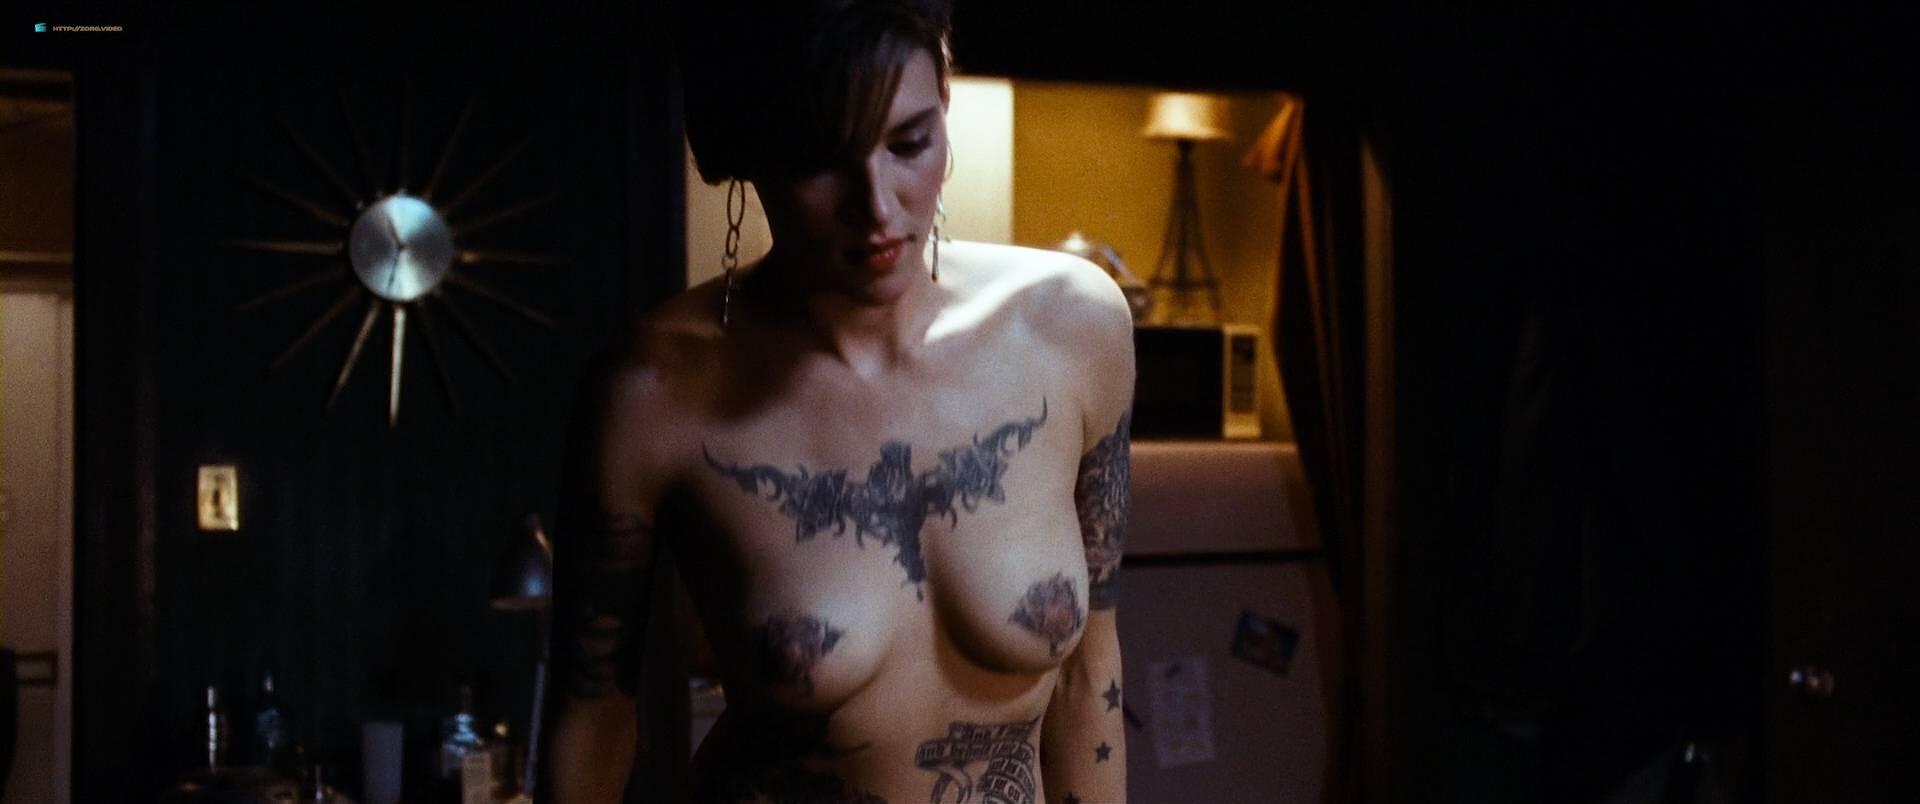 Alexandra Fox Videos Porno megan fox naked but covered and alexandra ruddy naked